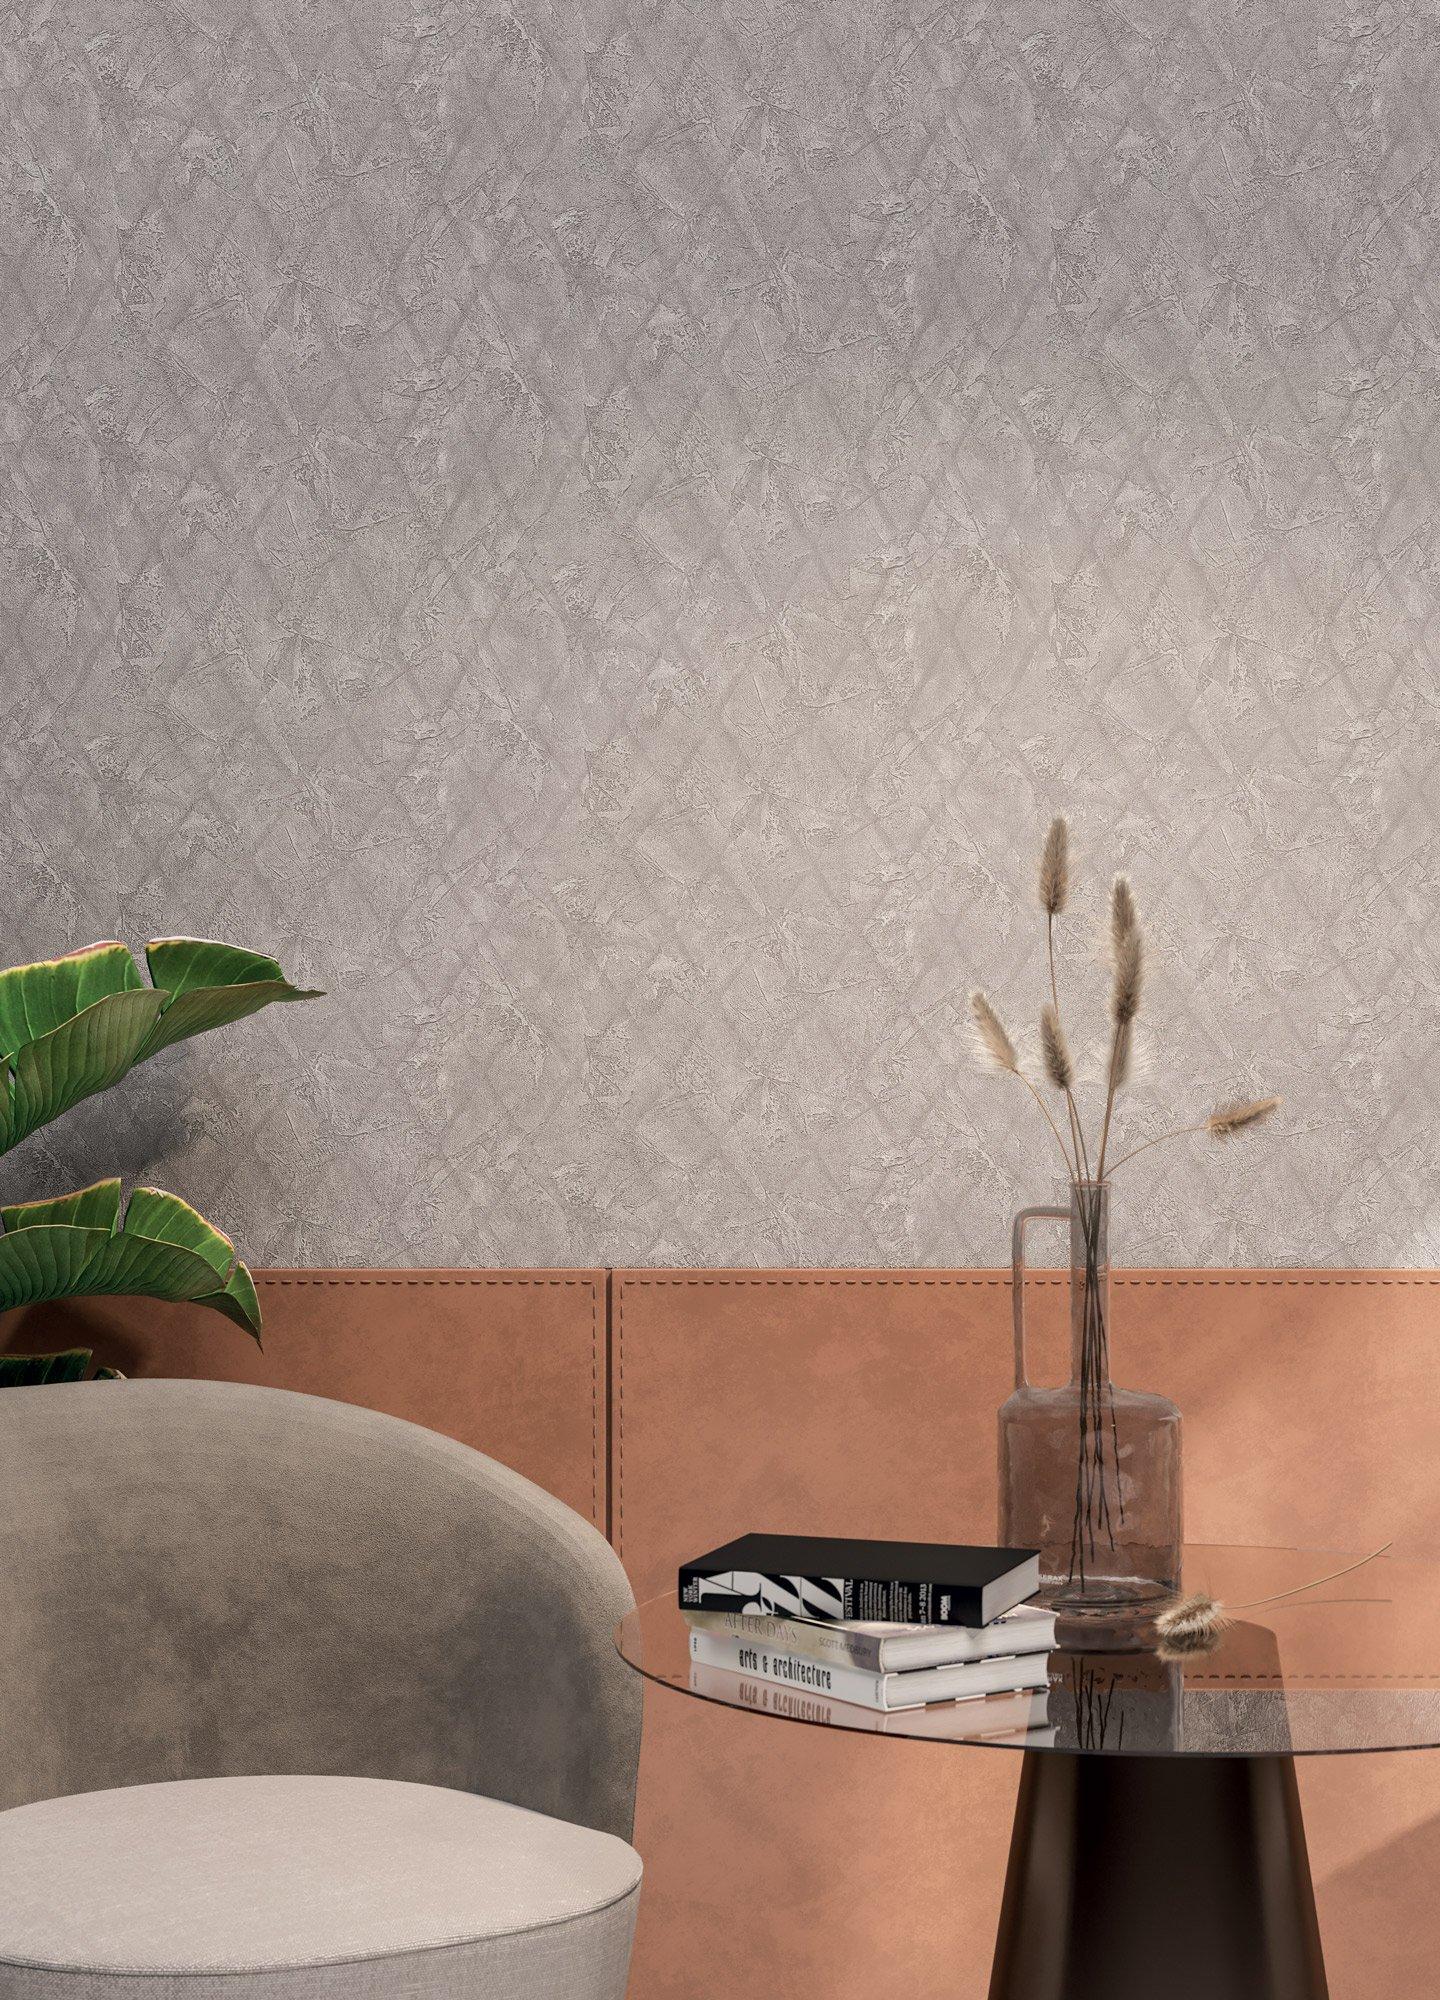 Arlecchino wallpaper